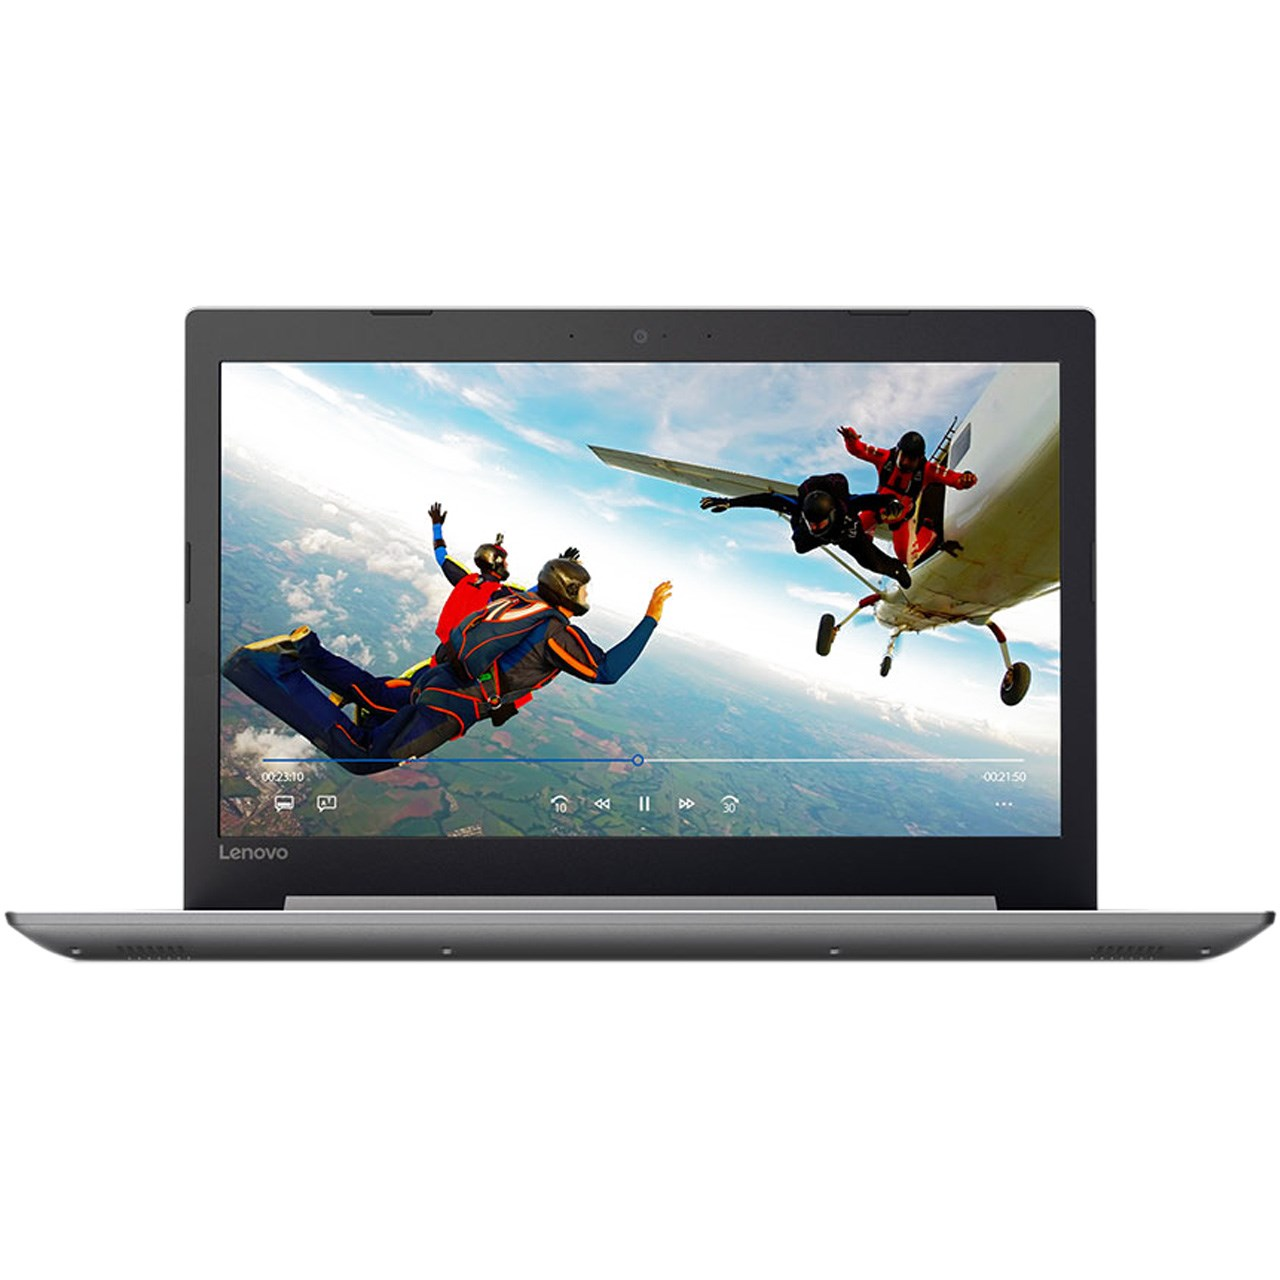 لپ تاپ 15 اینچی لنوو مدل Ideapad 320 - AS